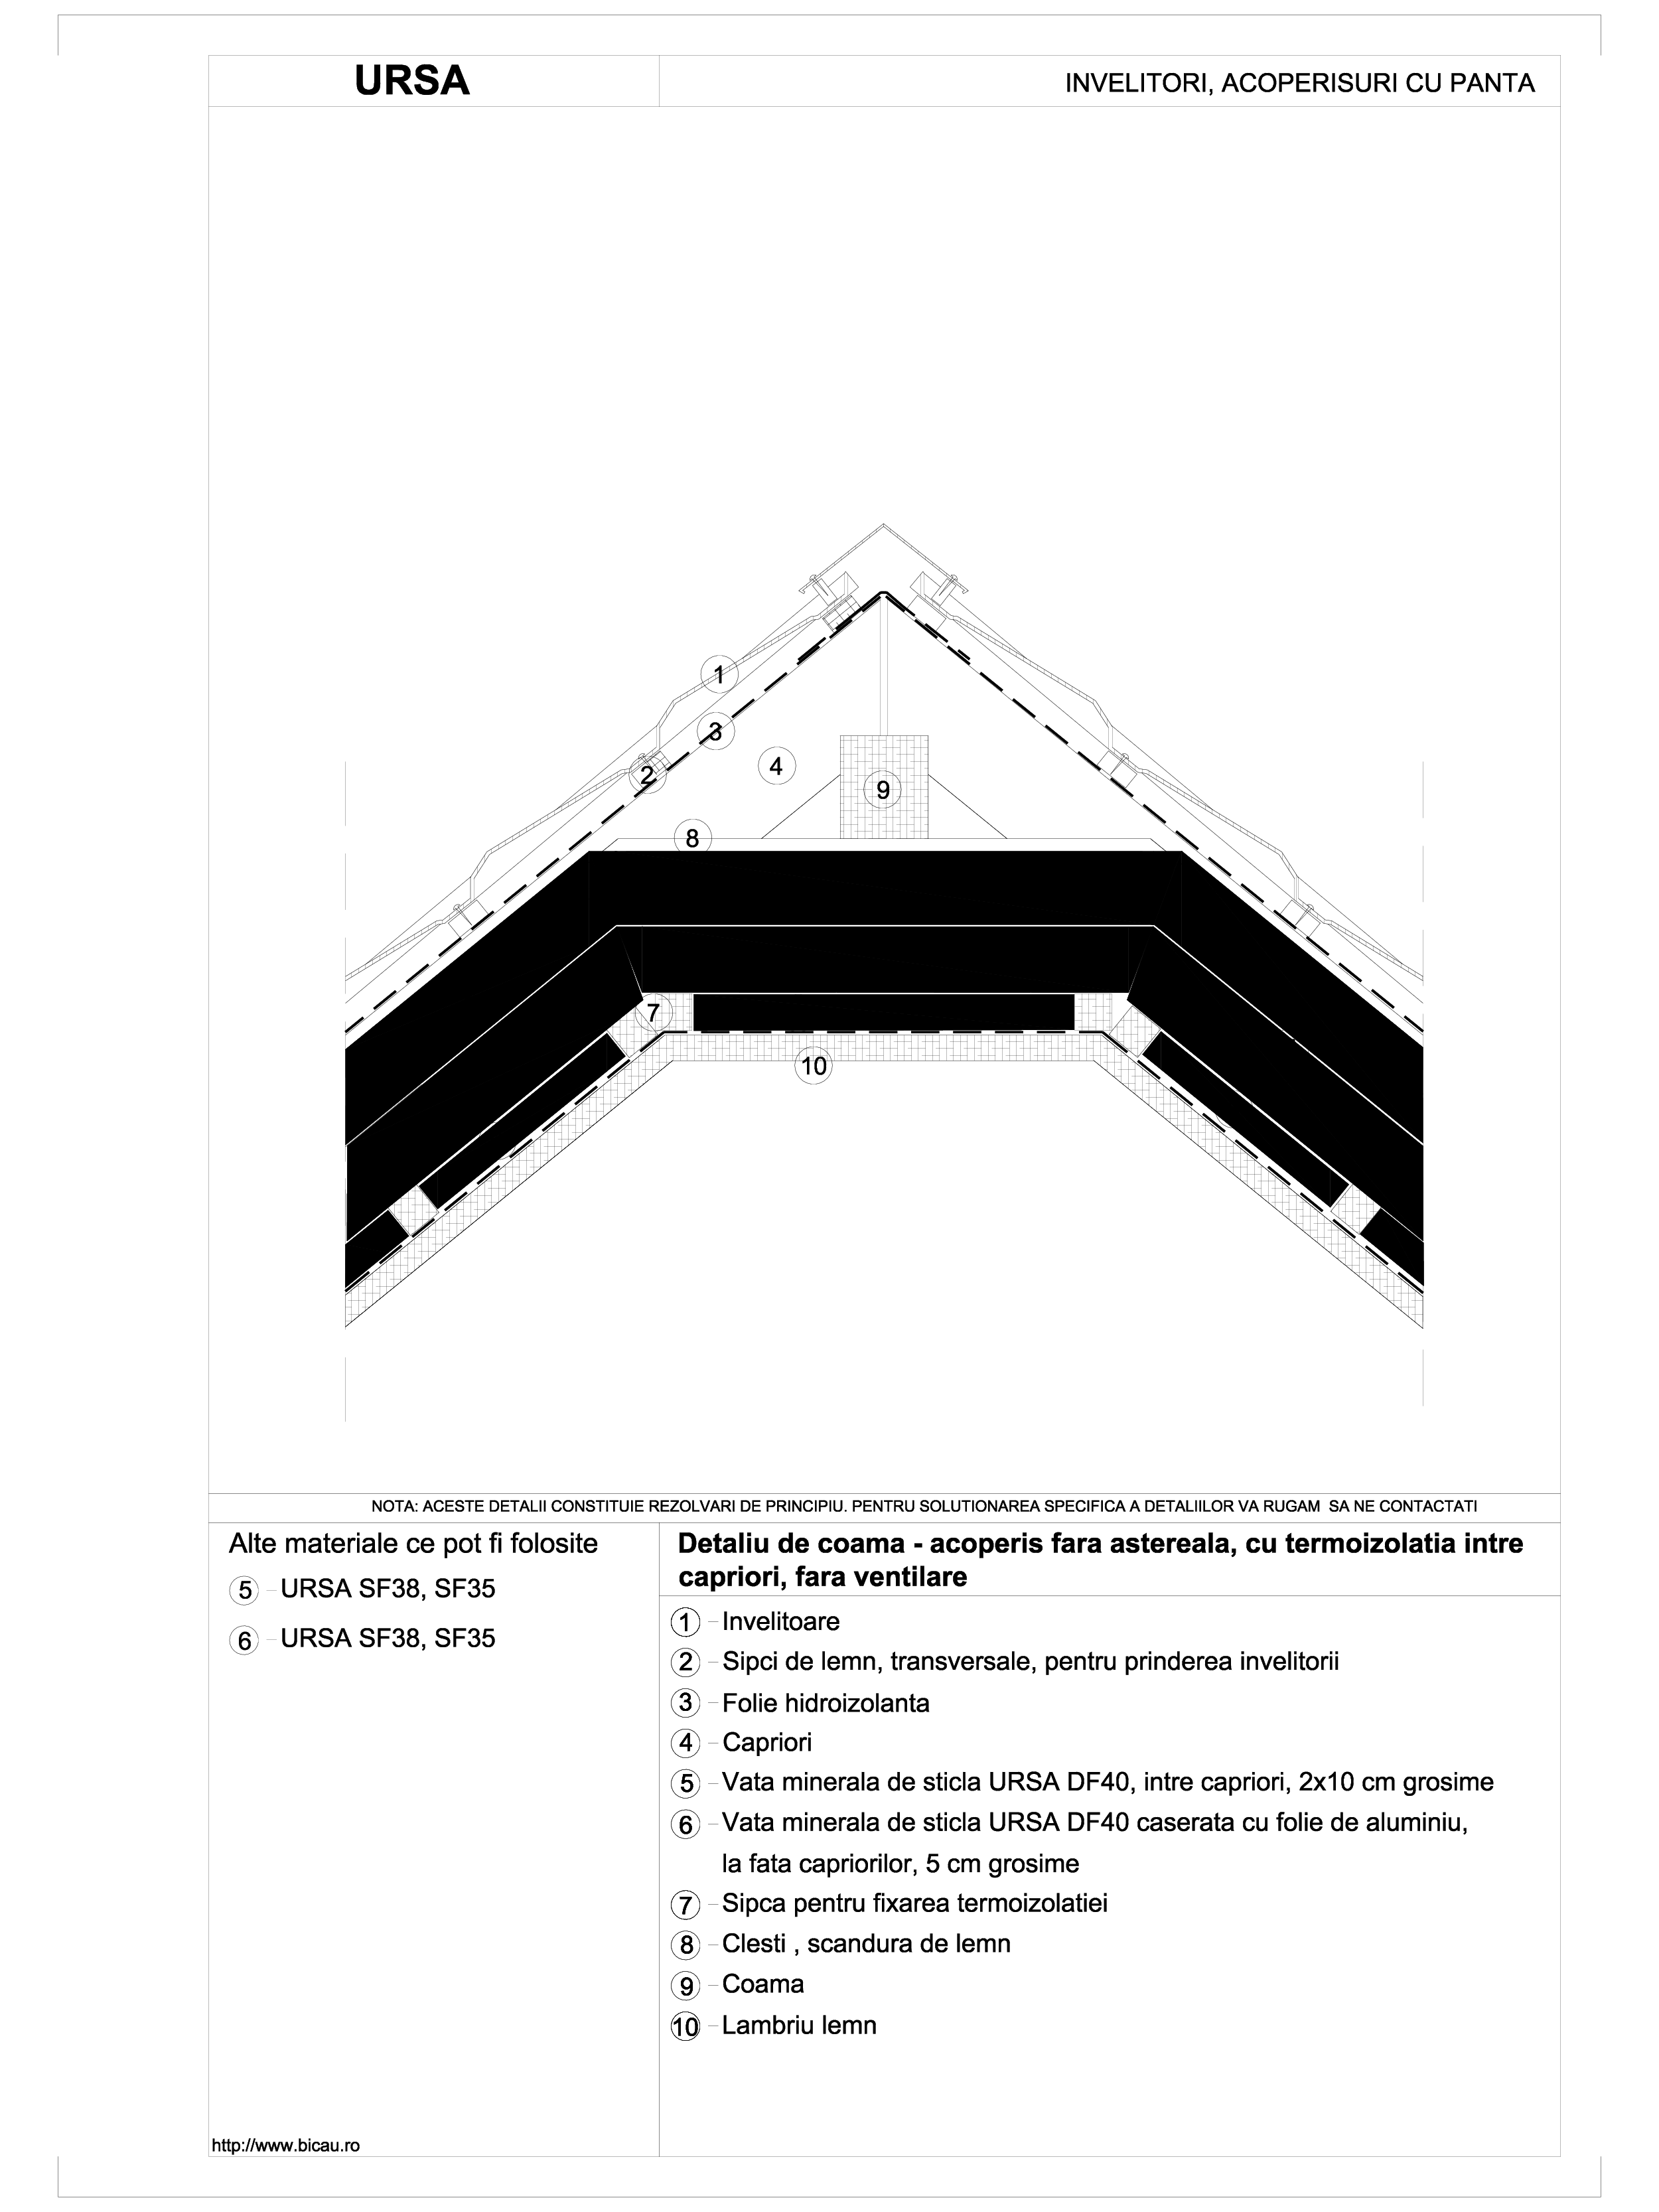 Detaliu de coama - acoperis fara astereala, cu termoizolatia intre capriori, fara ventilare SF 38 URSA Vata minerala pentru acoperisuri si mansarde URSA ROMANIA   - Pagina 1